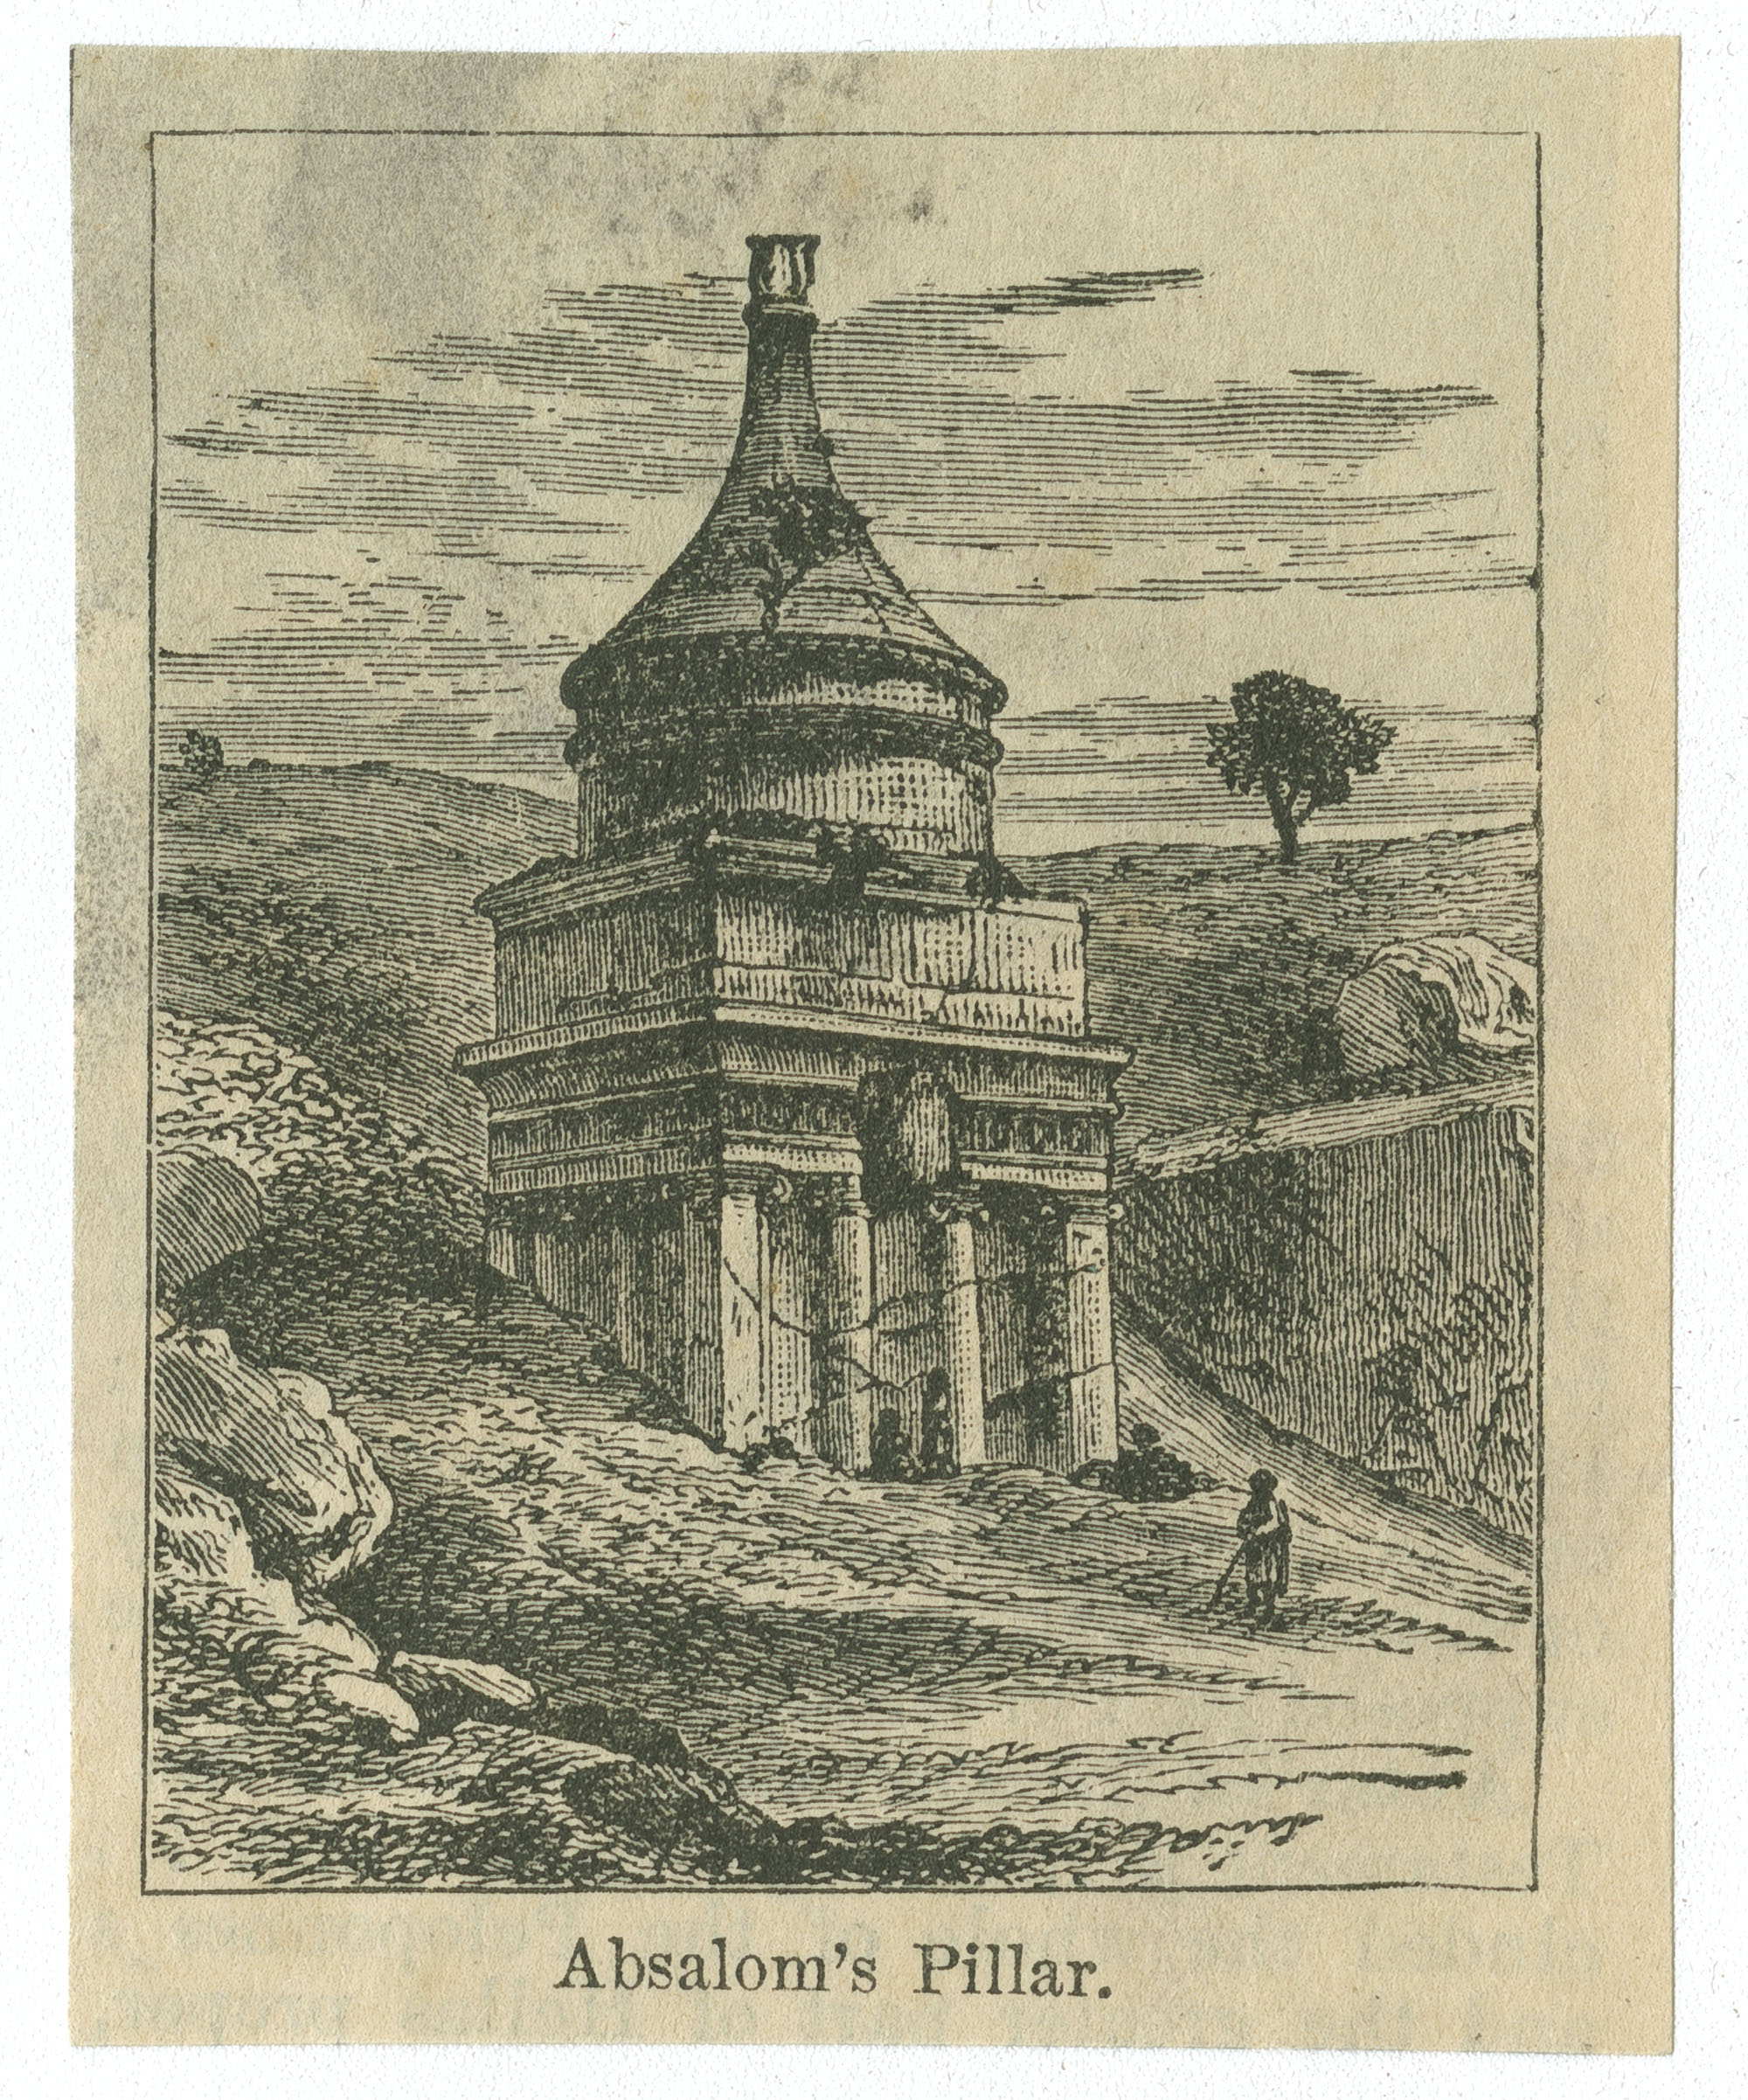 Absalom's Pillar